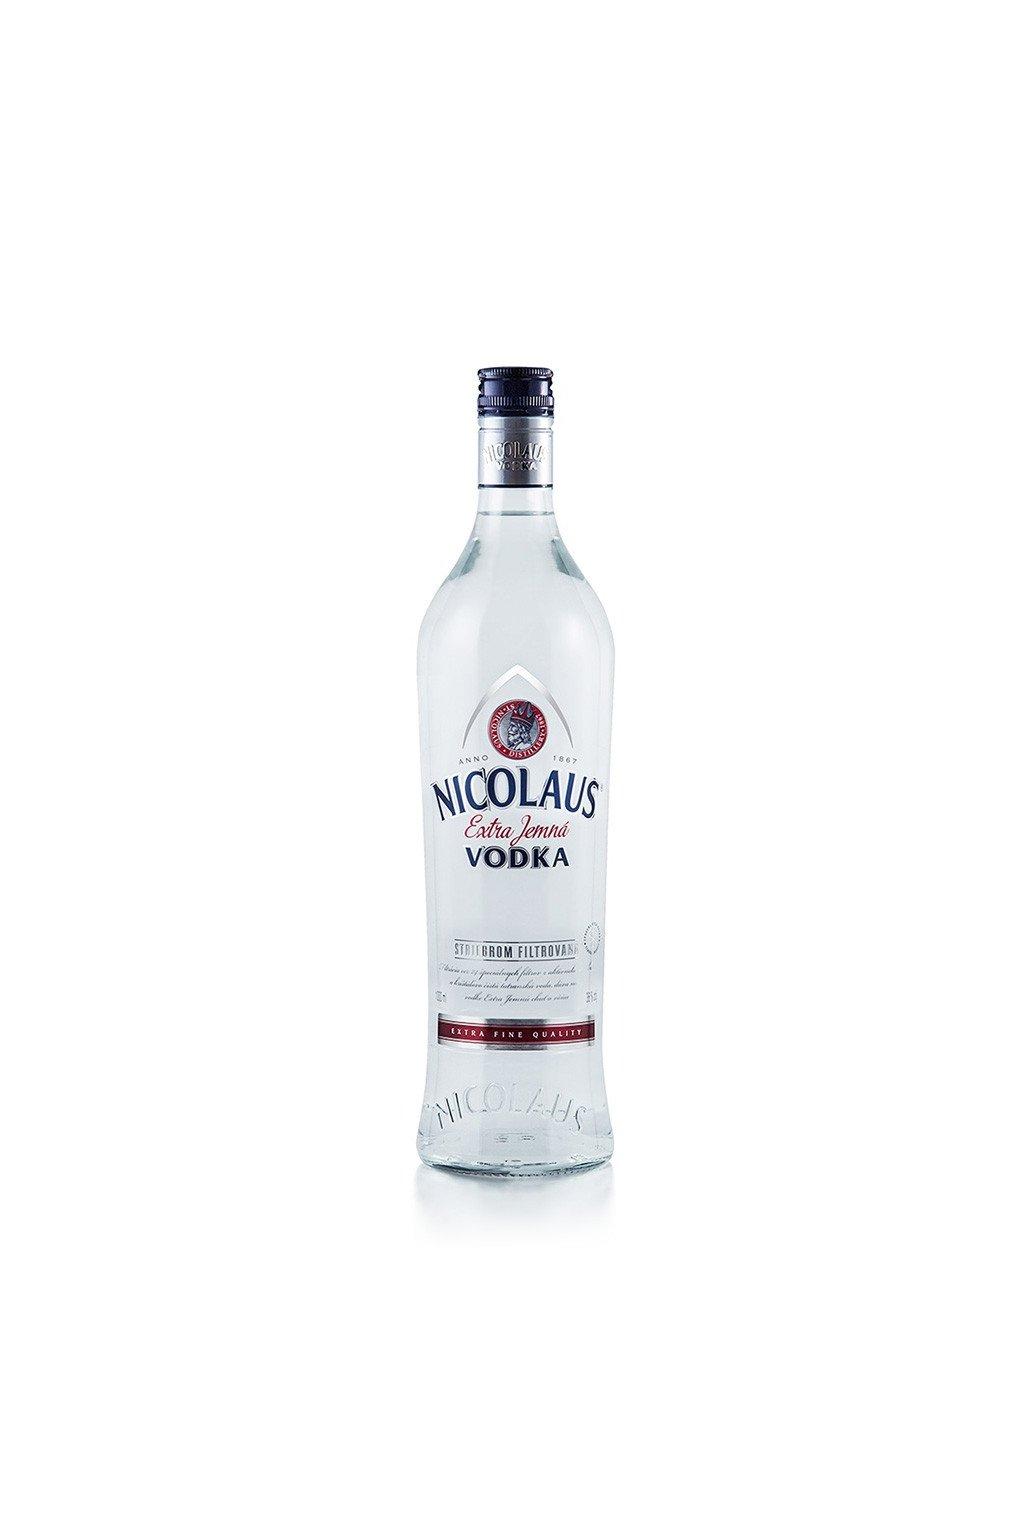 nicolaus vodka extra jemna 1l 38